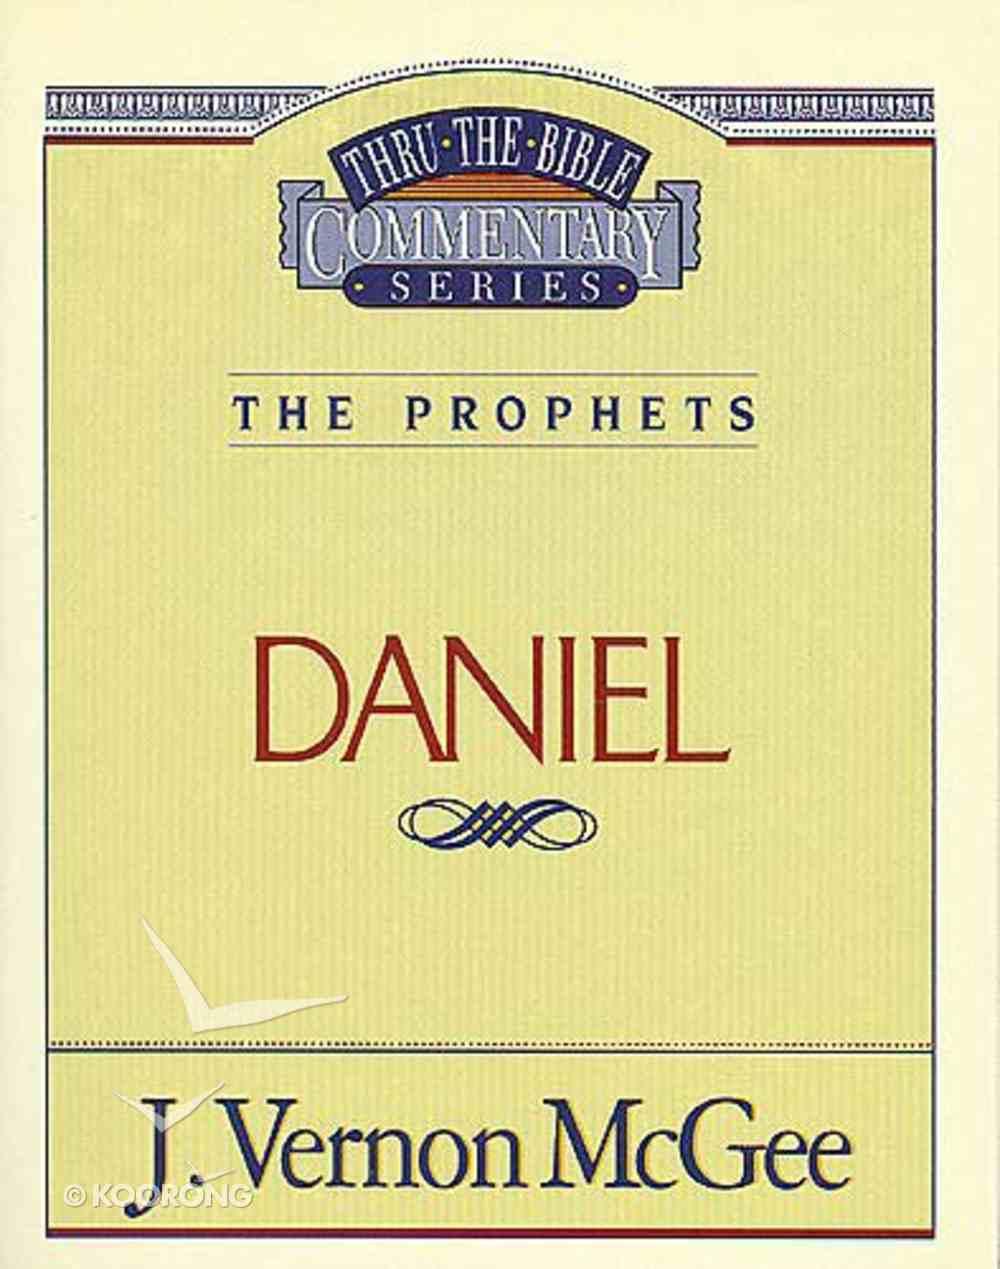 Thru the Bible OT #26: Daniel (#26 in Thru The Bible Old Testament Series) Paperback